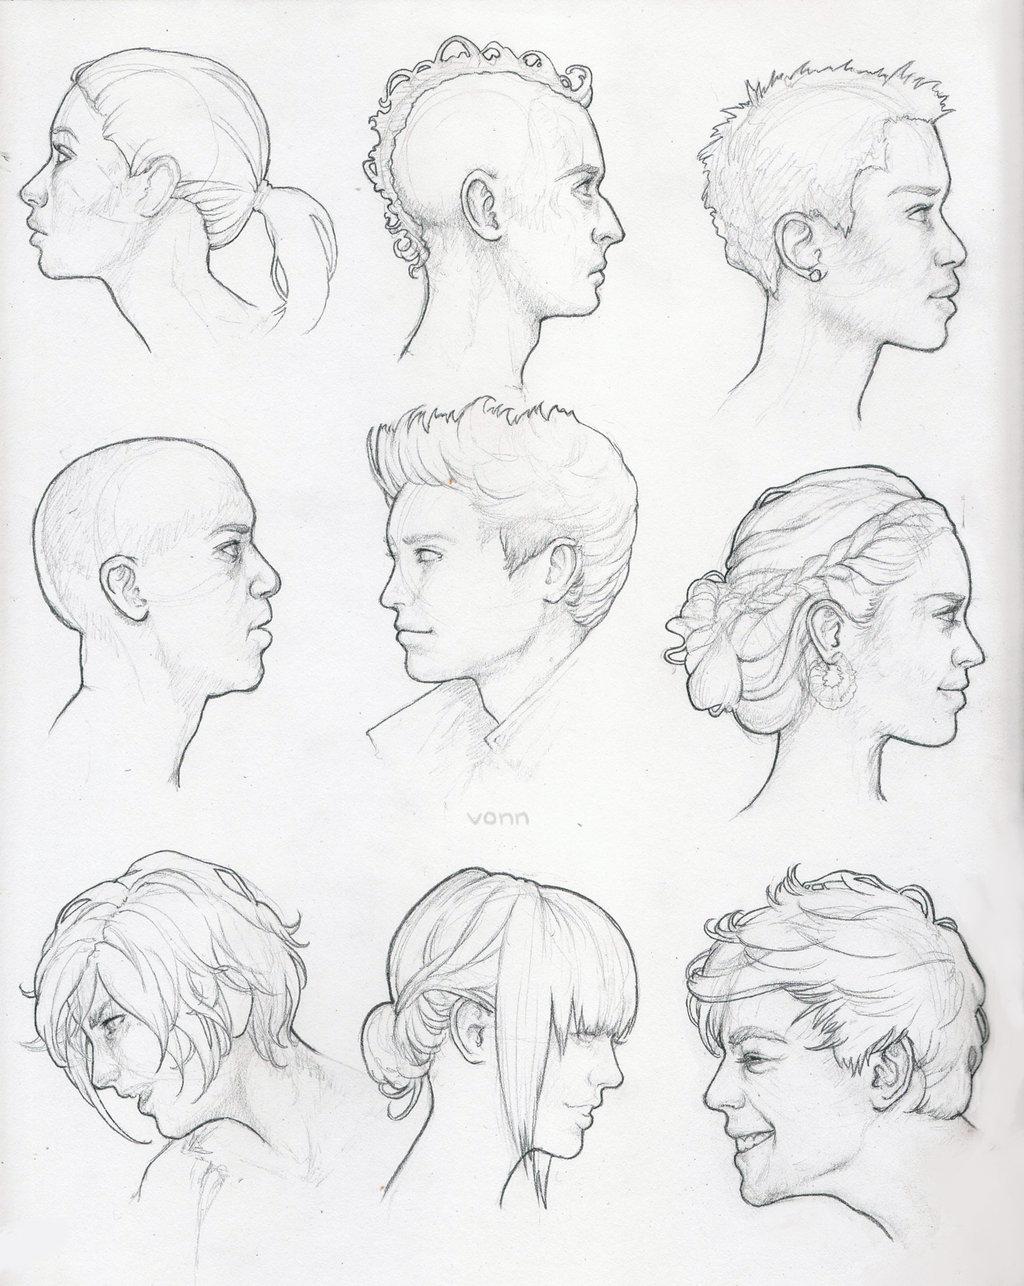 1024x1286 Profile Study Sketches By Tvonn9